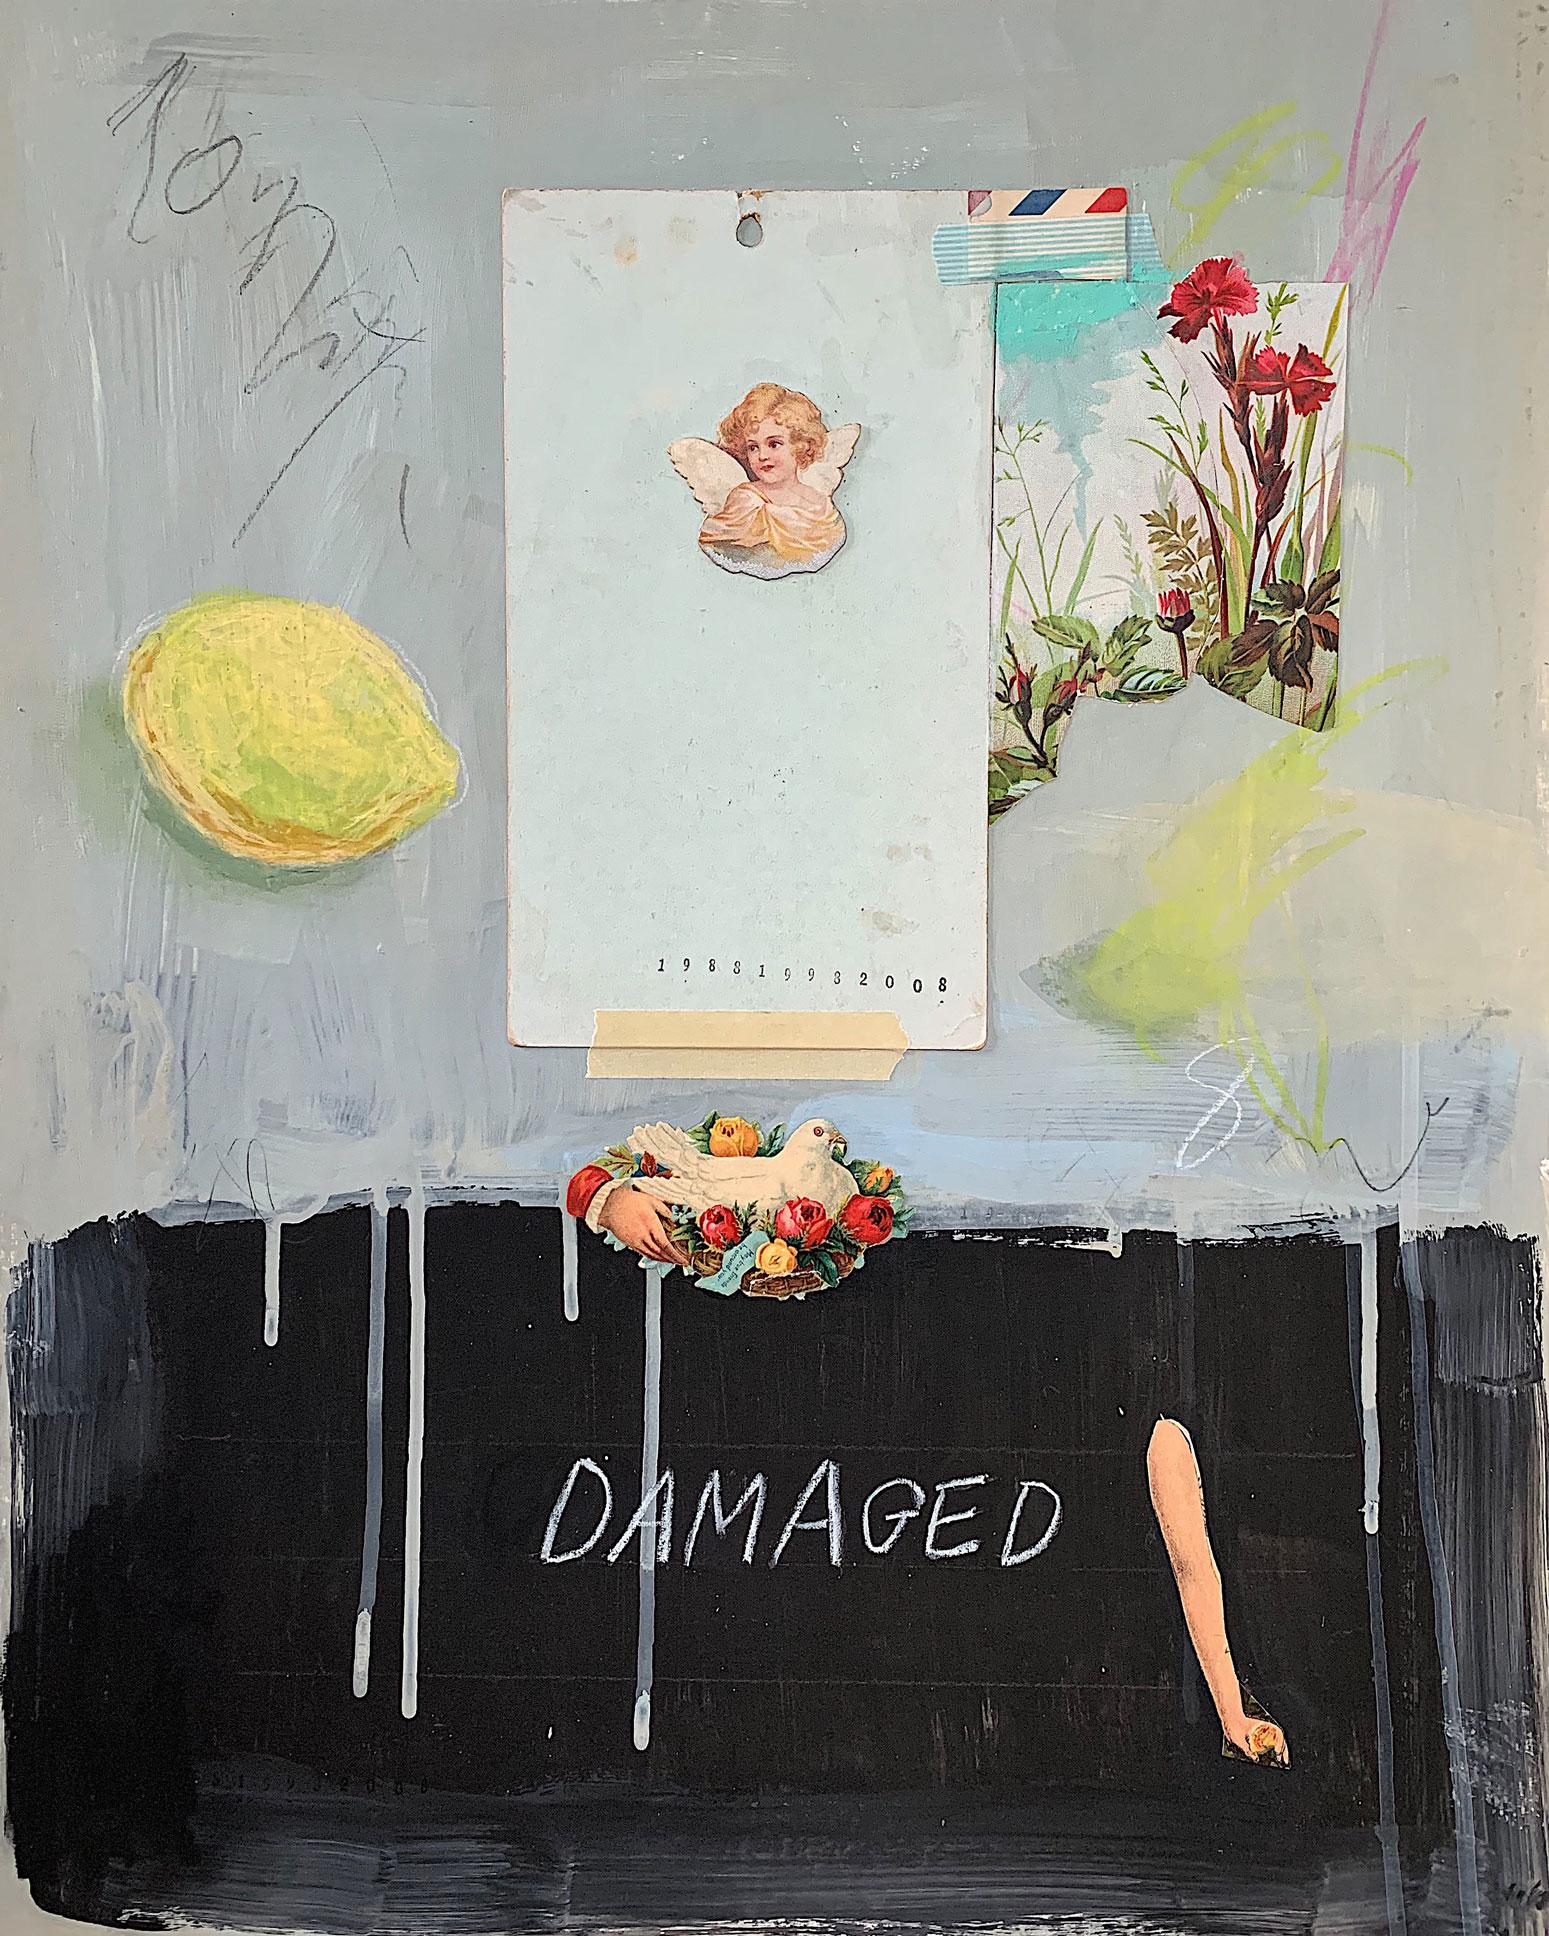 For-the-Damaged-sm.jpg